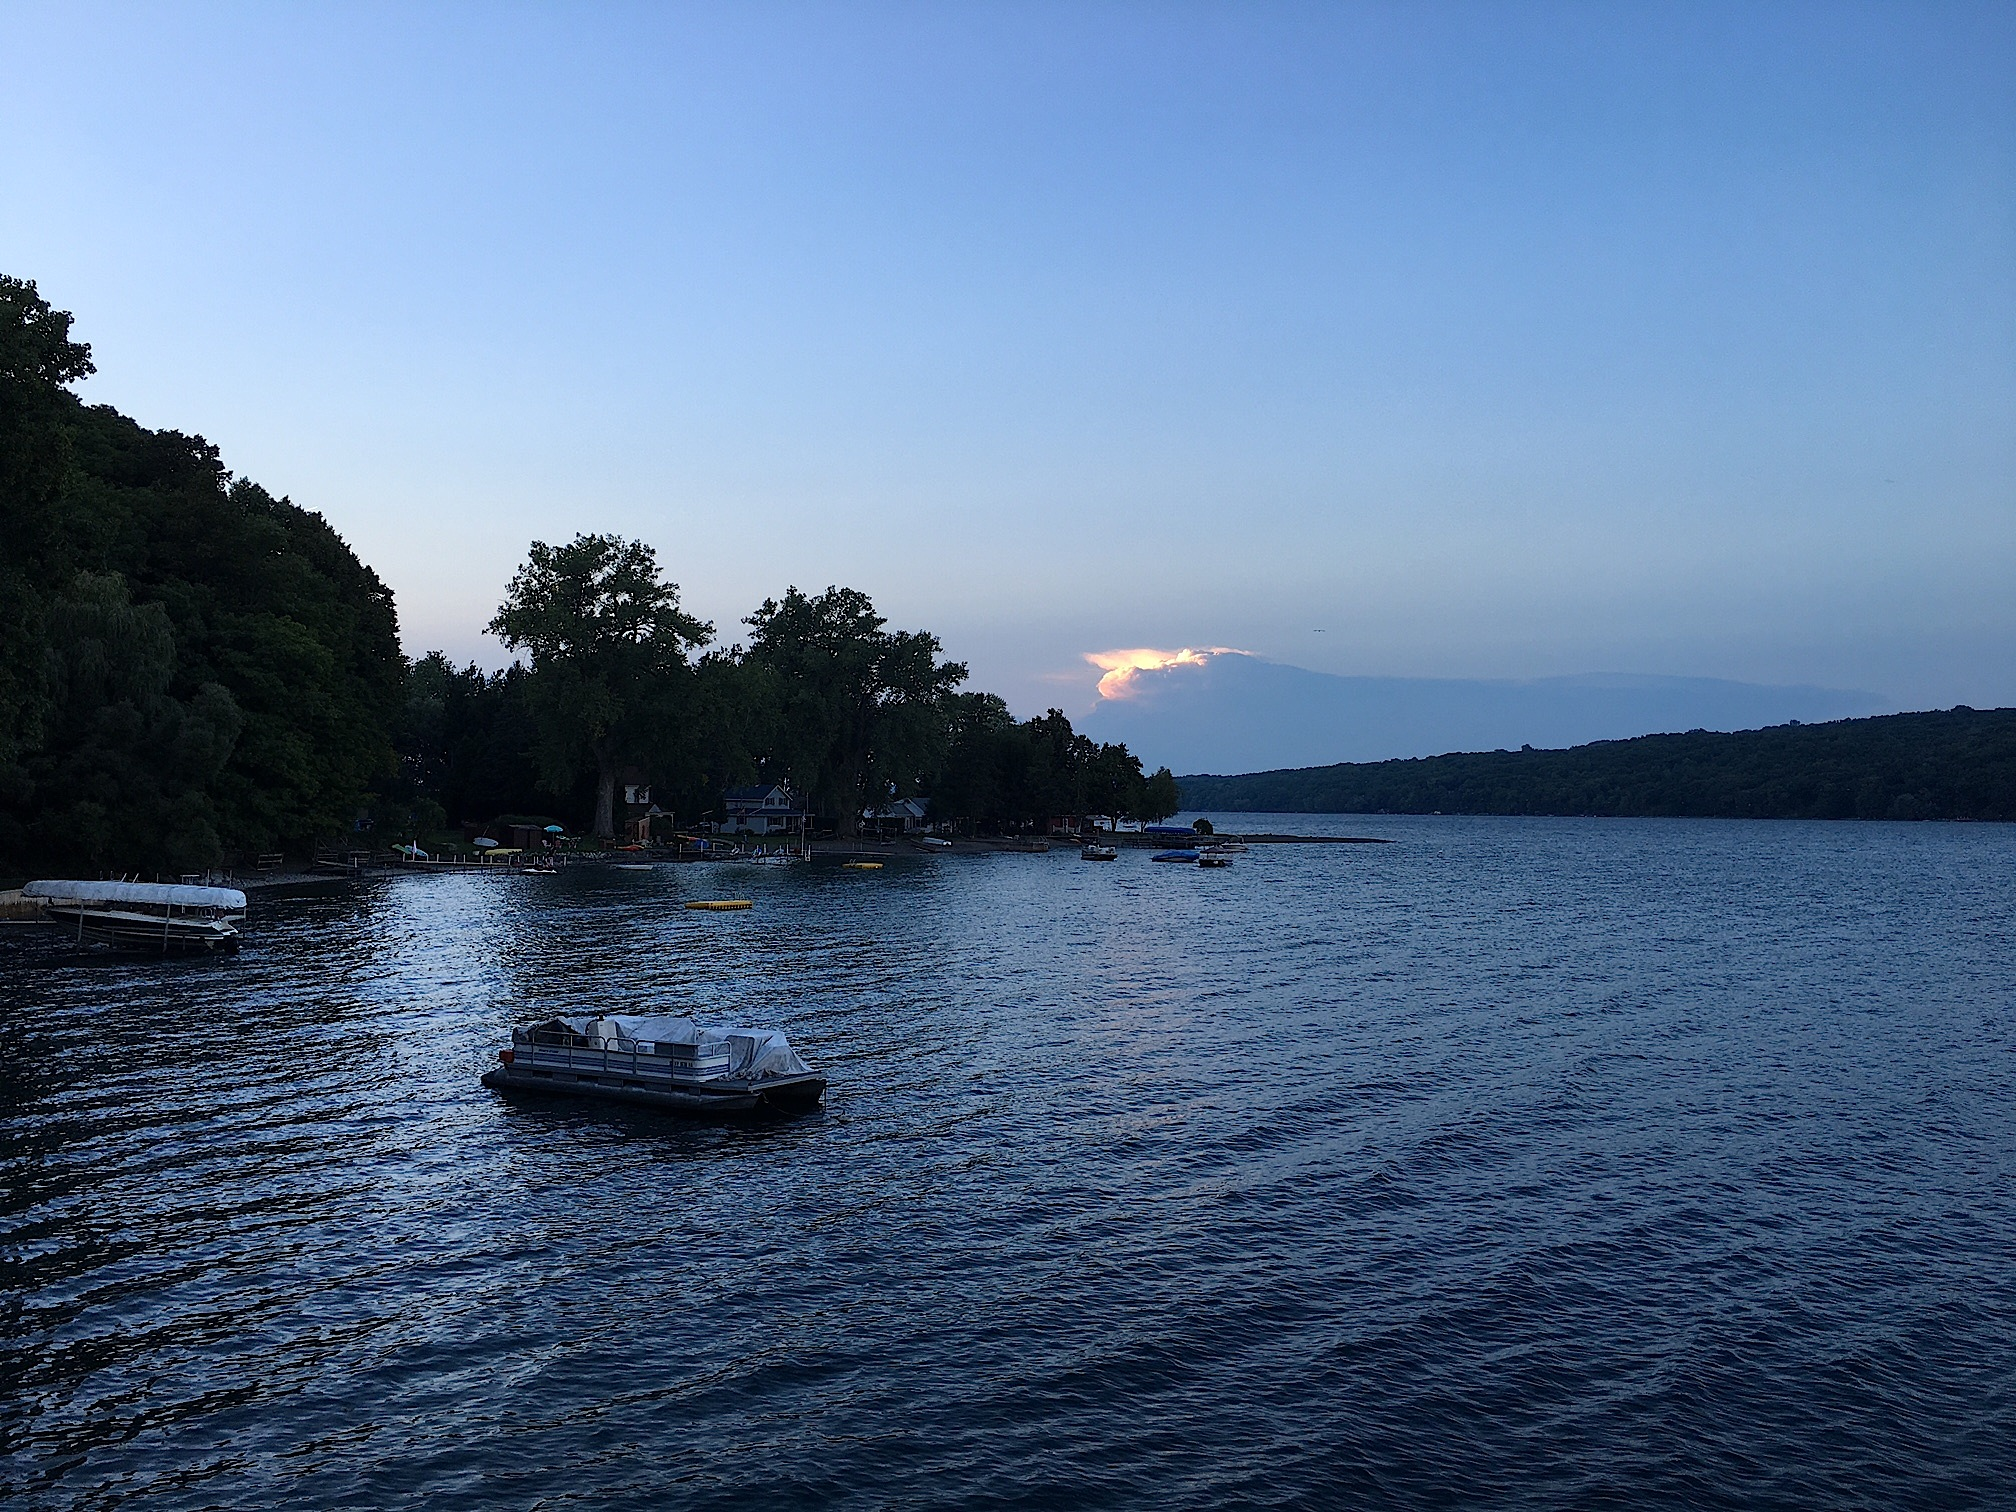 Skaneateles Lake, 9-10-16